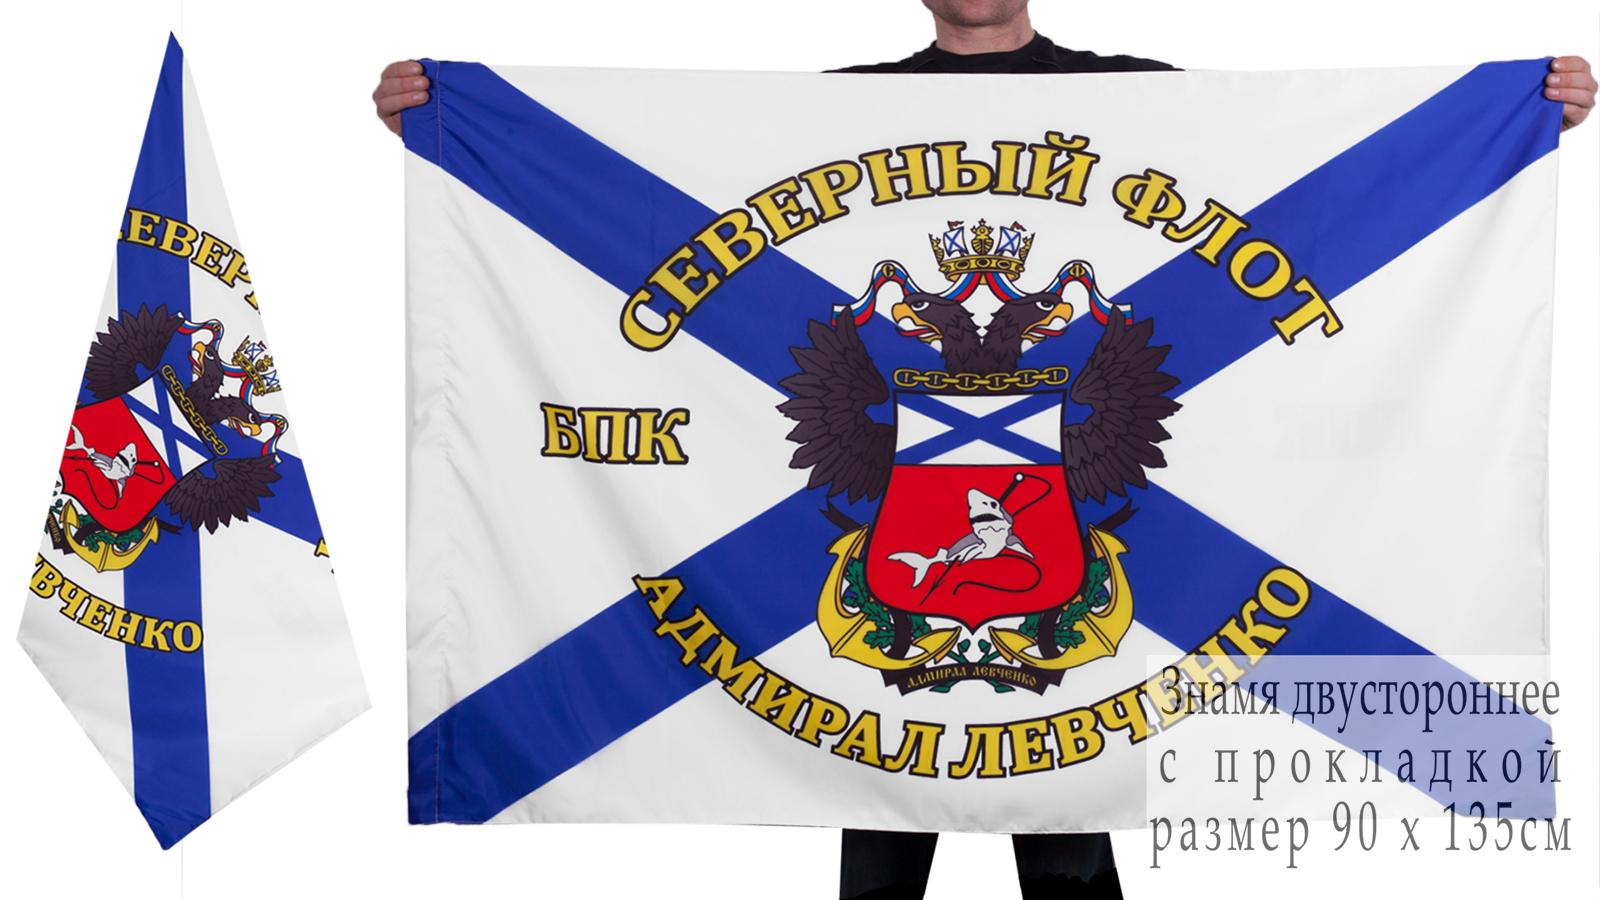 Купить двухсторонний флаг БПК «Адмирал Левченко»